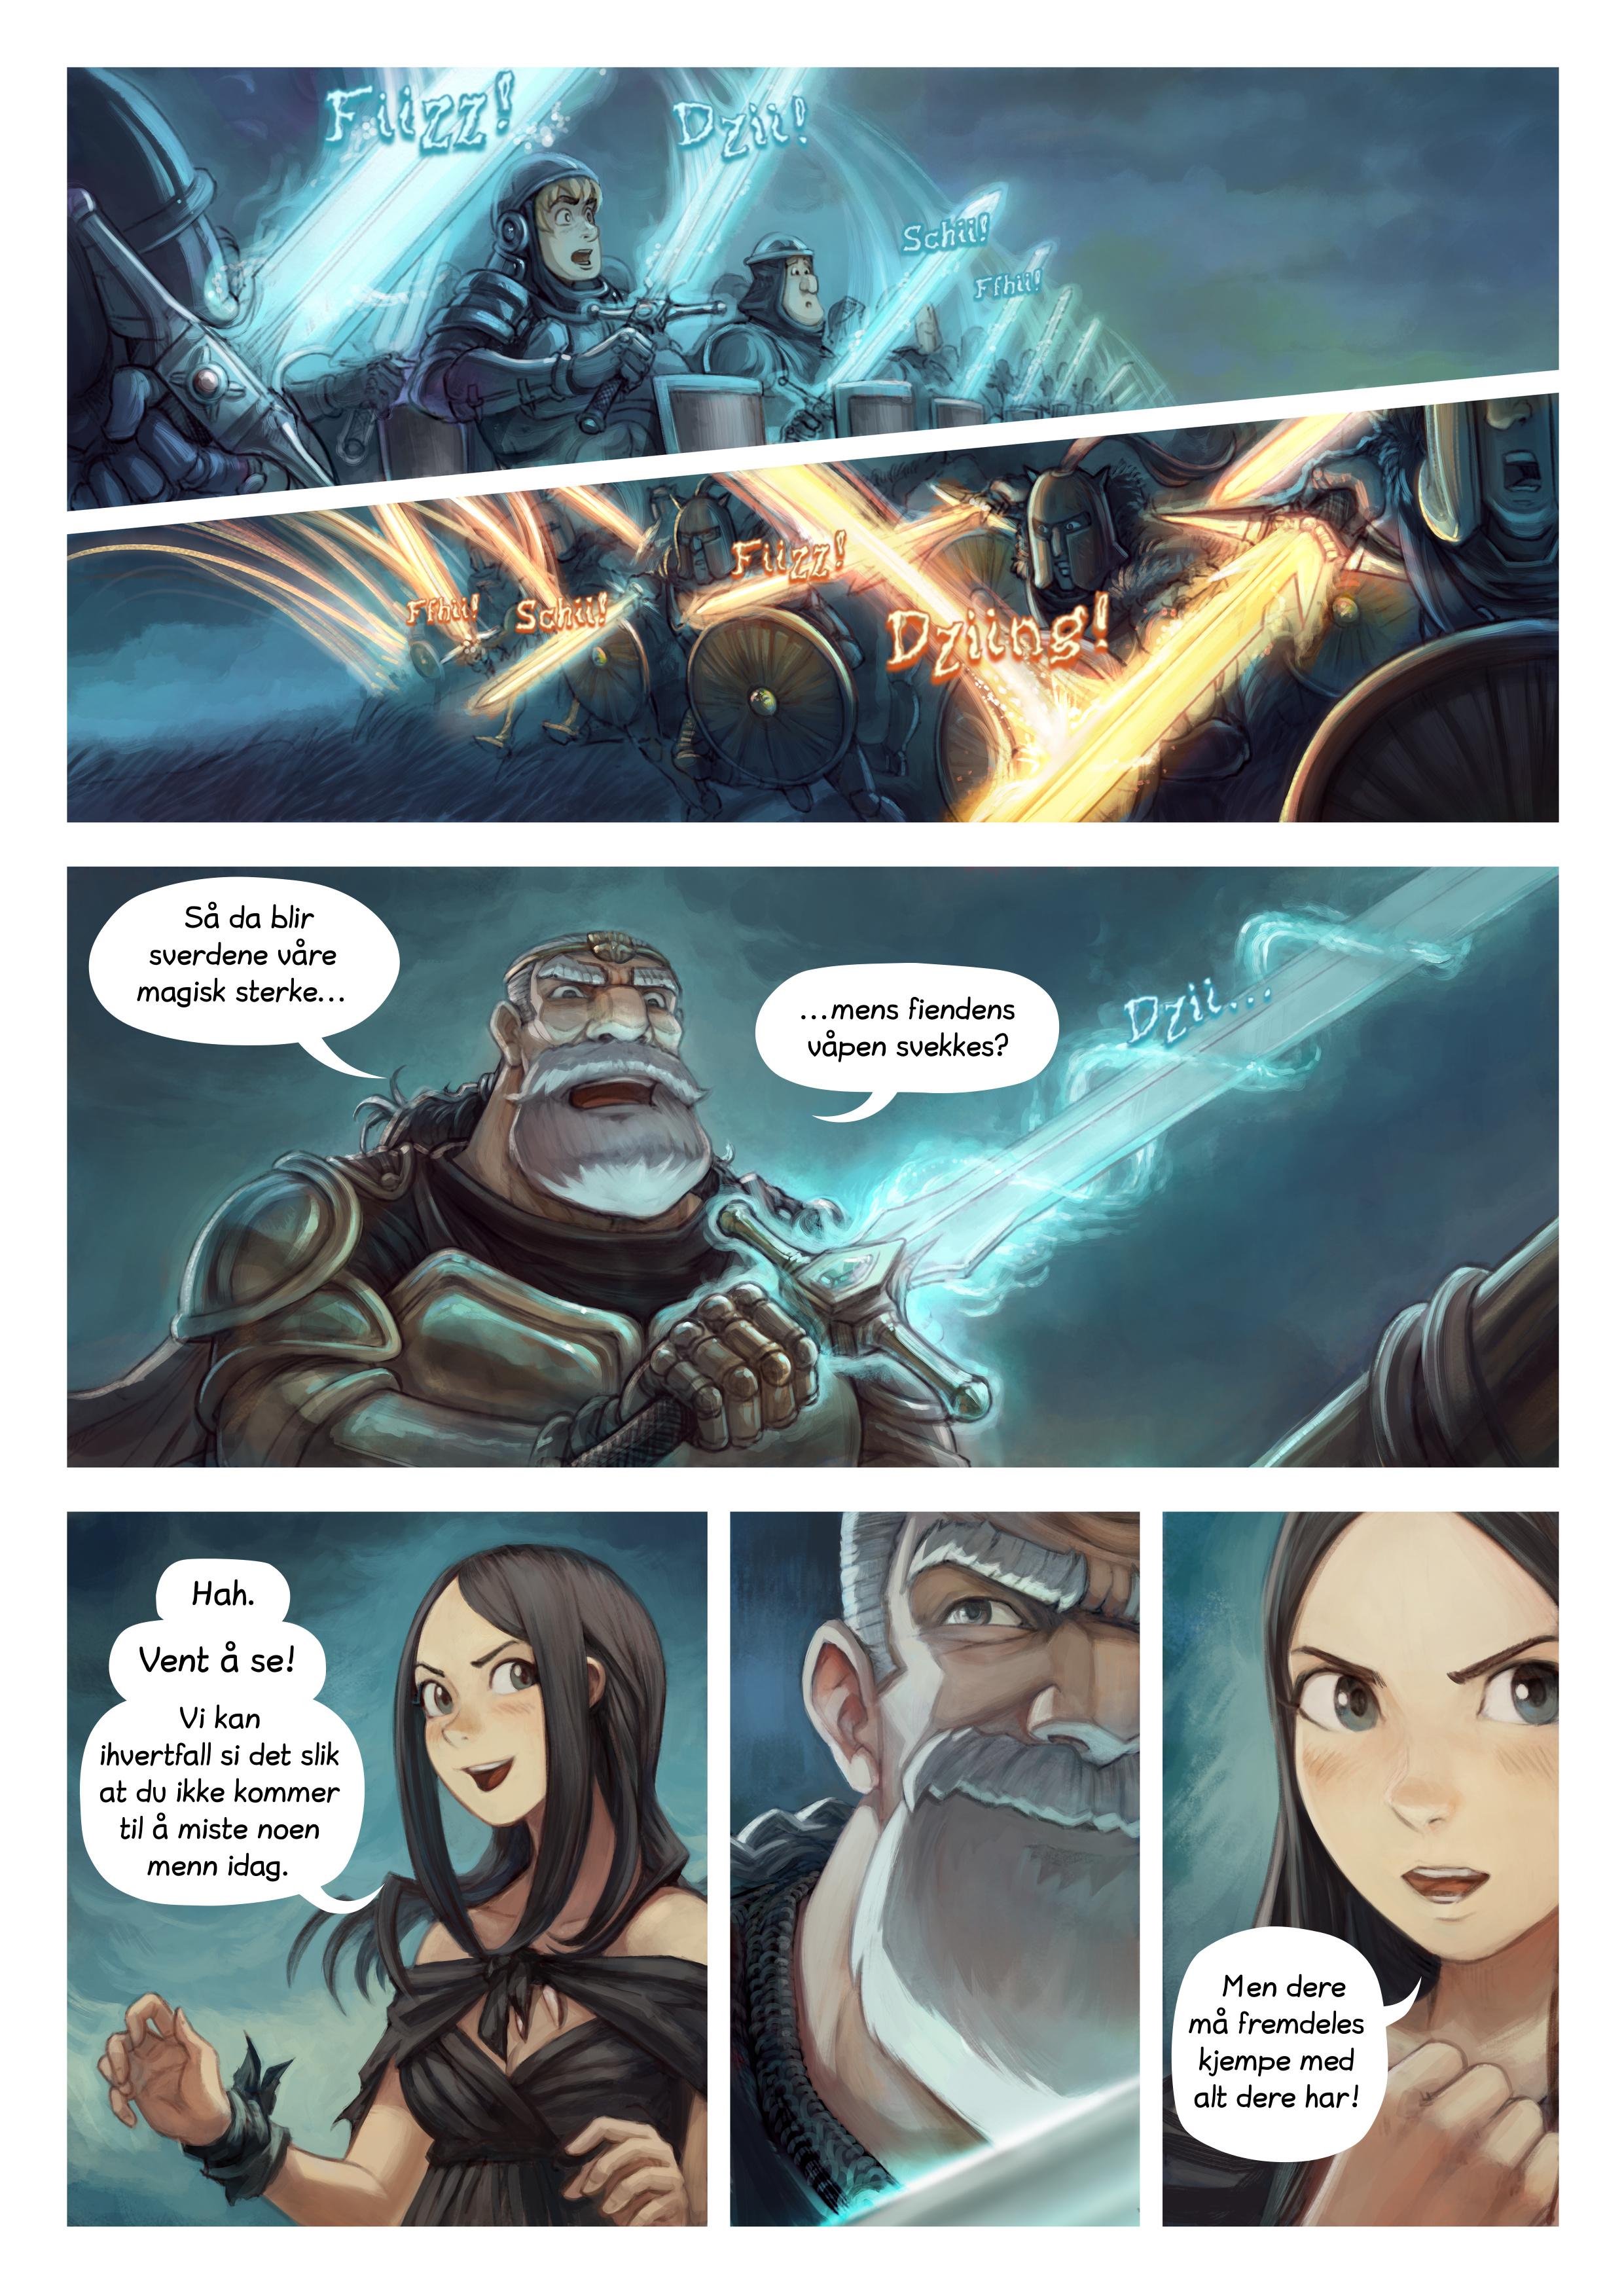 Episode 33: Krigsformelen, Page 3